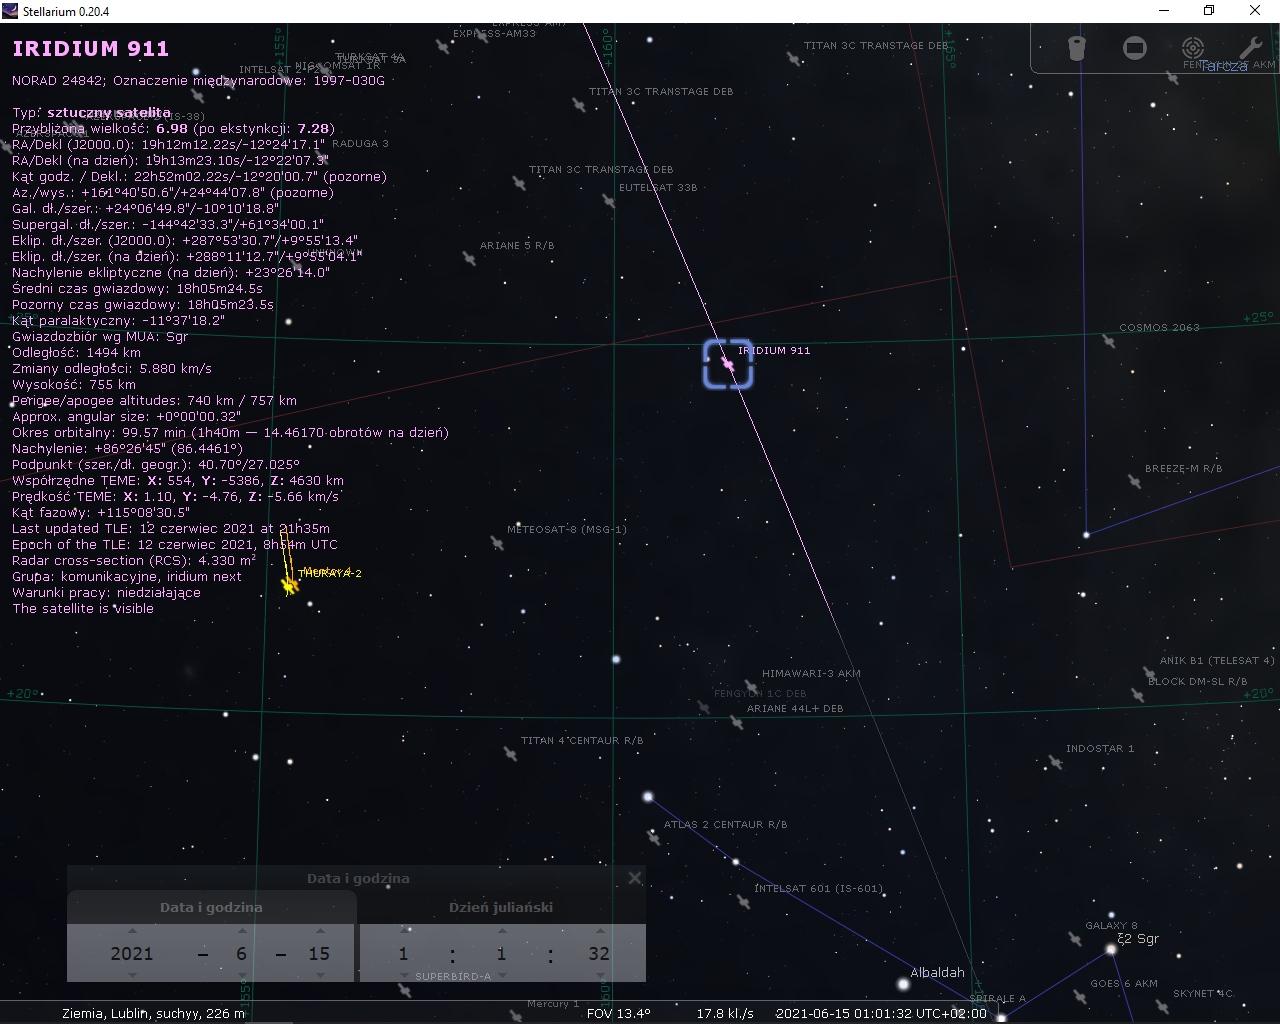 IRIDIUM-911_15-06-2021_01-01-32_flary.jpg.36cf1e839b8610a4f1c284b384d04636.jpg